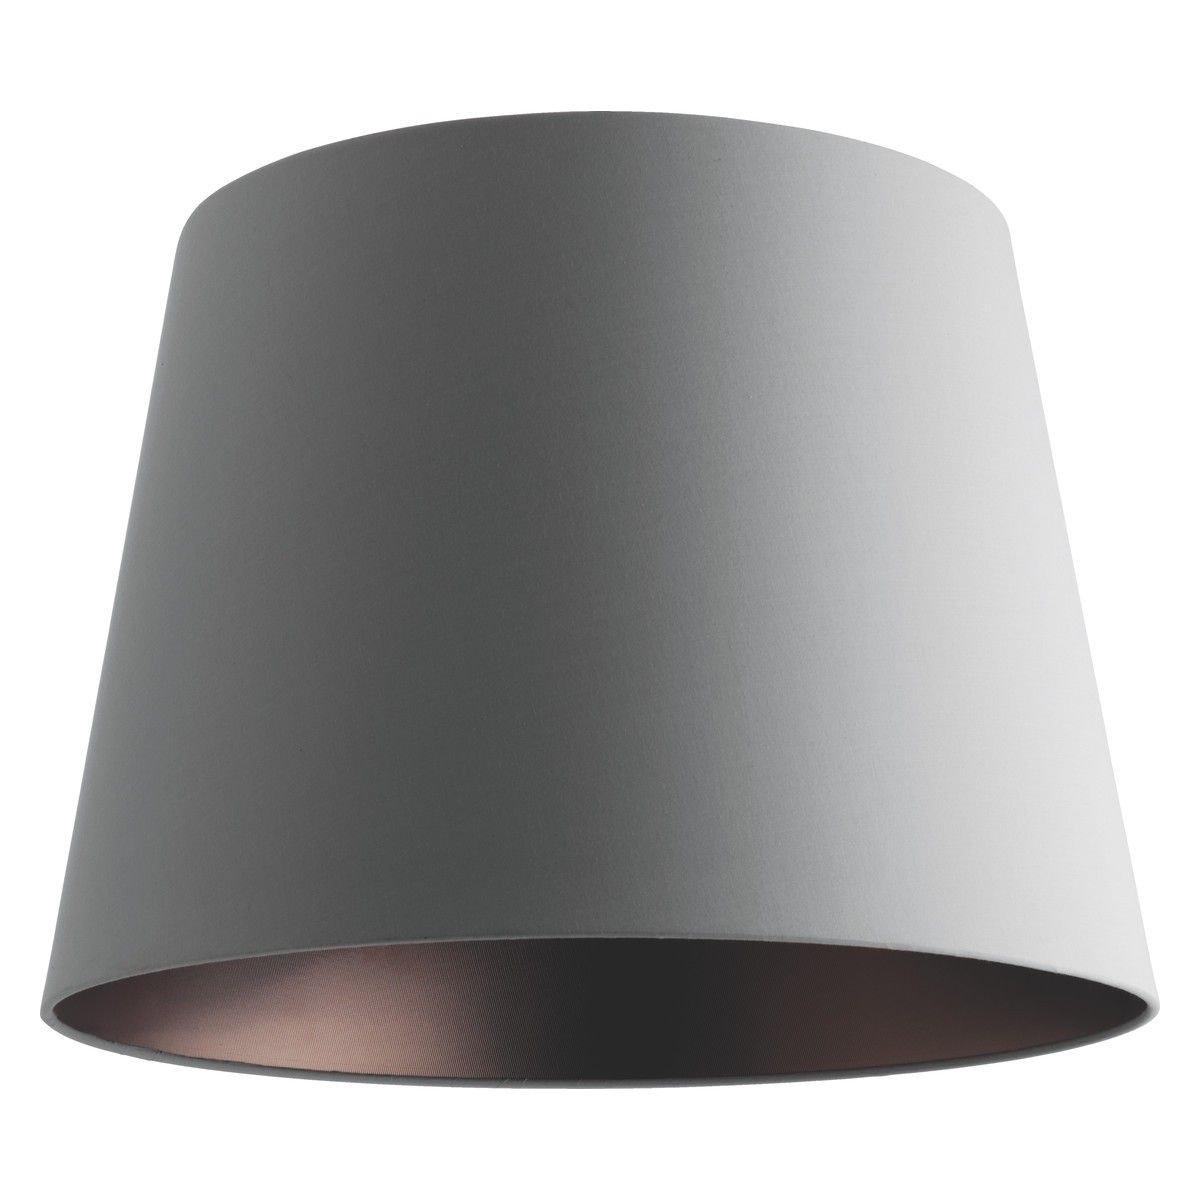 GRANDE Grey/bronze Large Tapered Lampshade D49 X H36cm